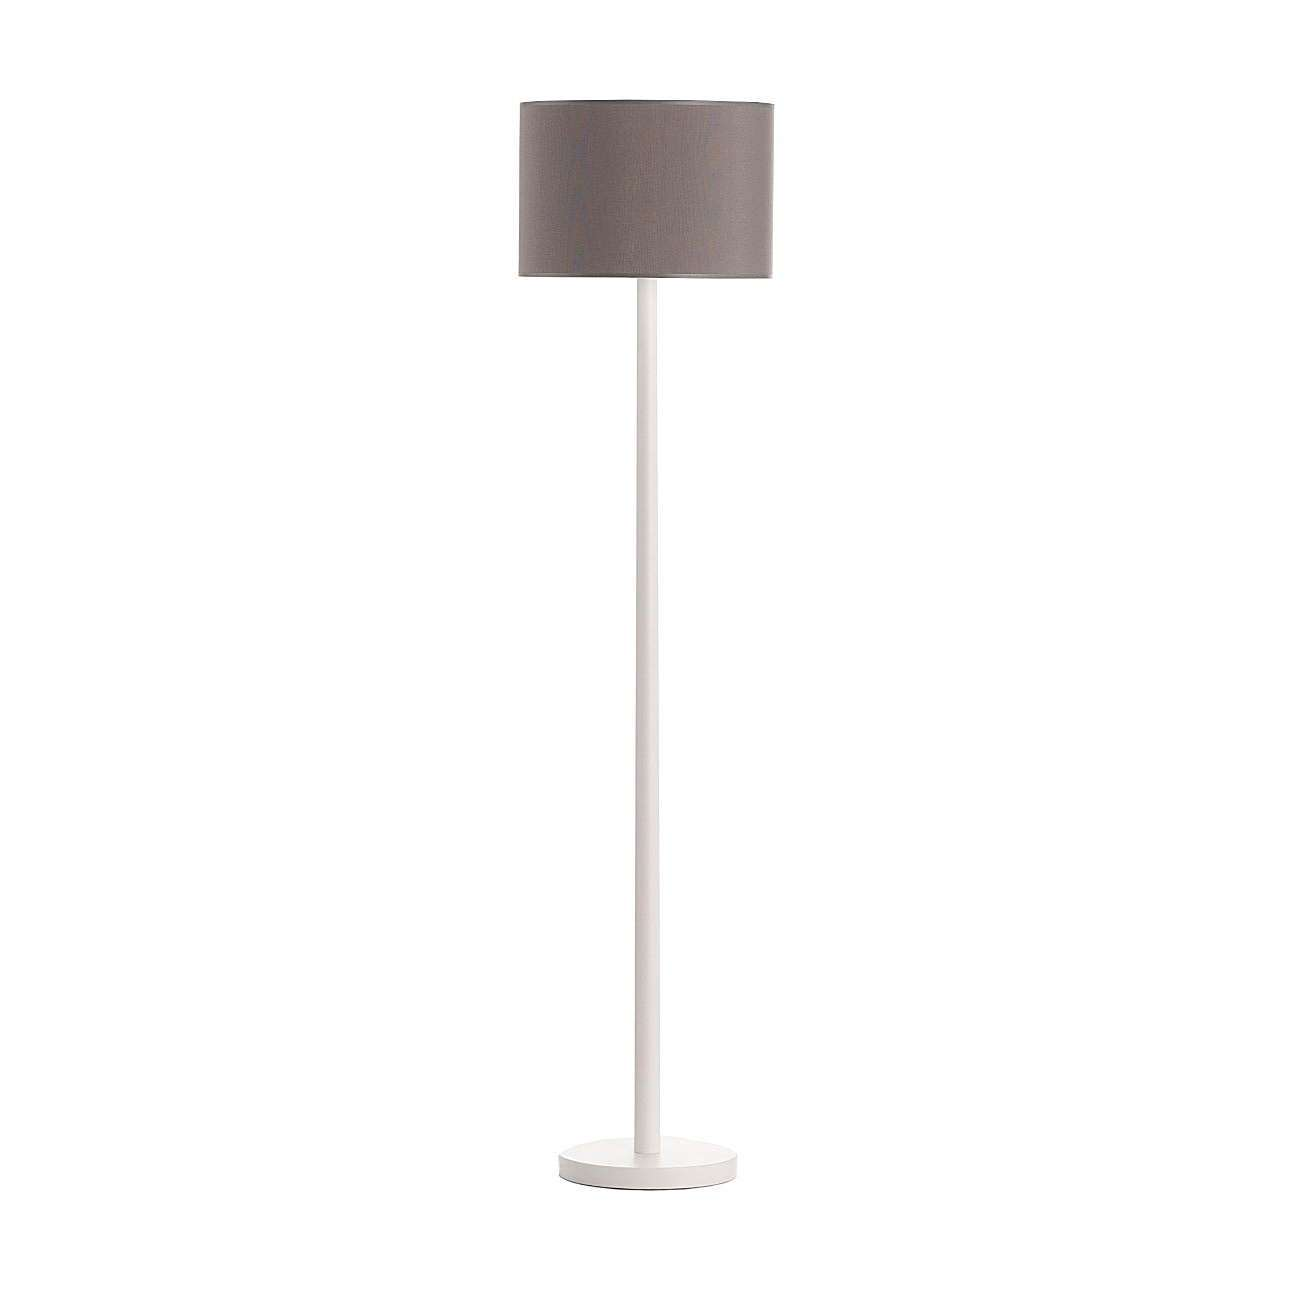 Floor lamp Gray Happiness